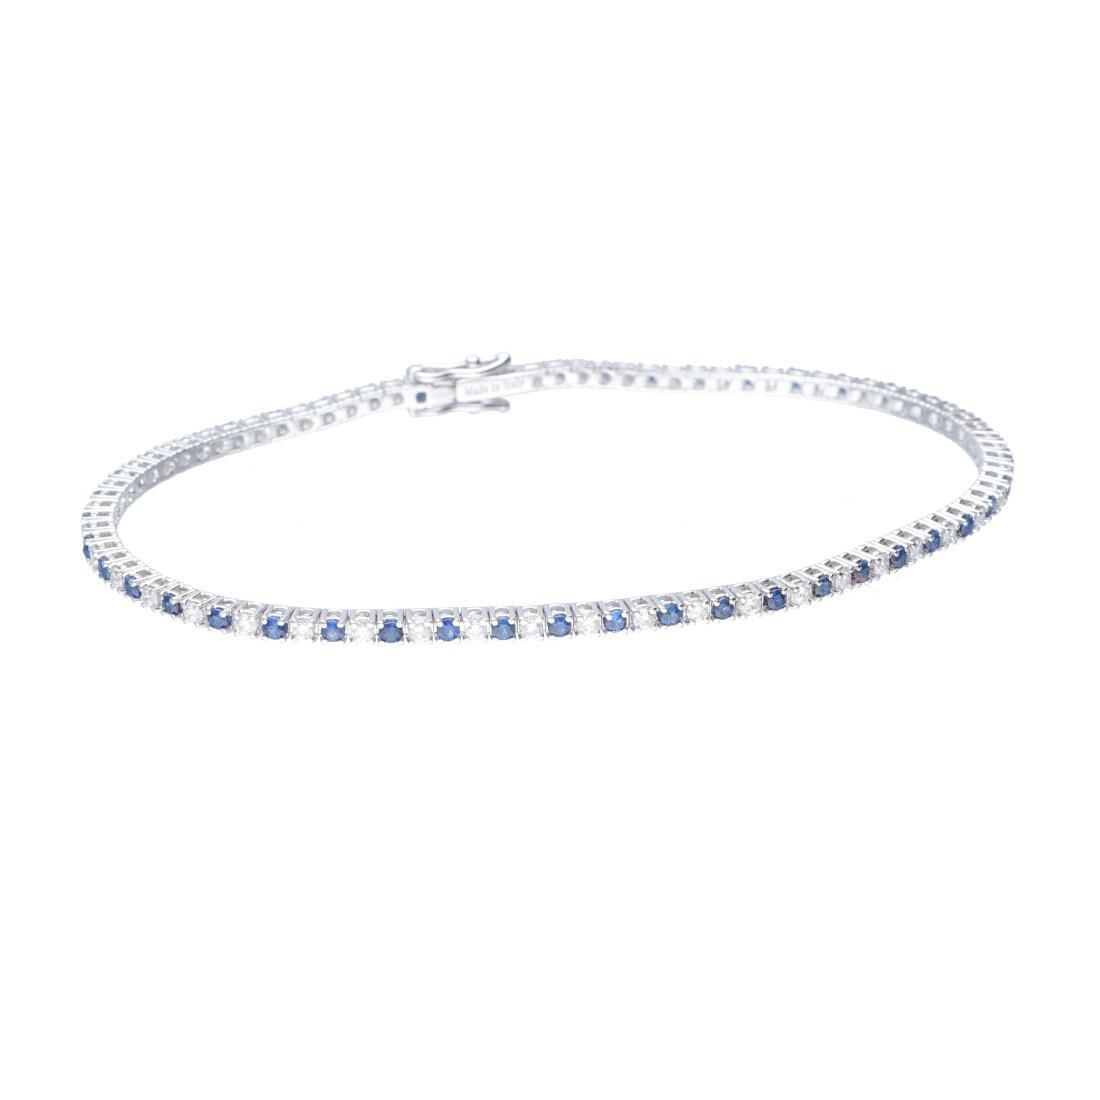 Bracciale tennis in oro bianco con diamanti e zaffiri - ALFIERI ST JOHN